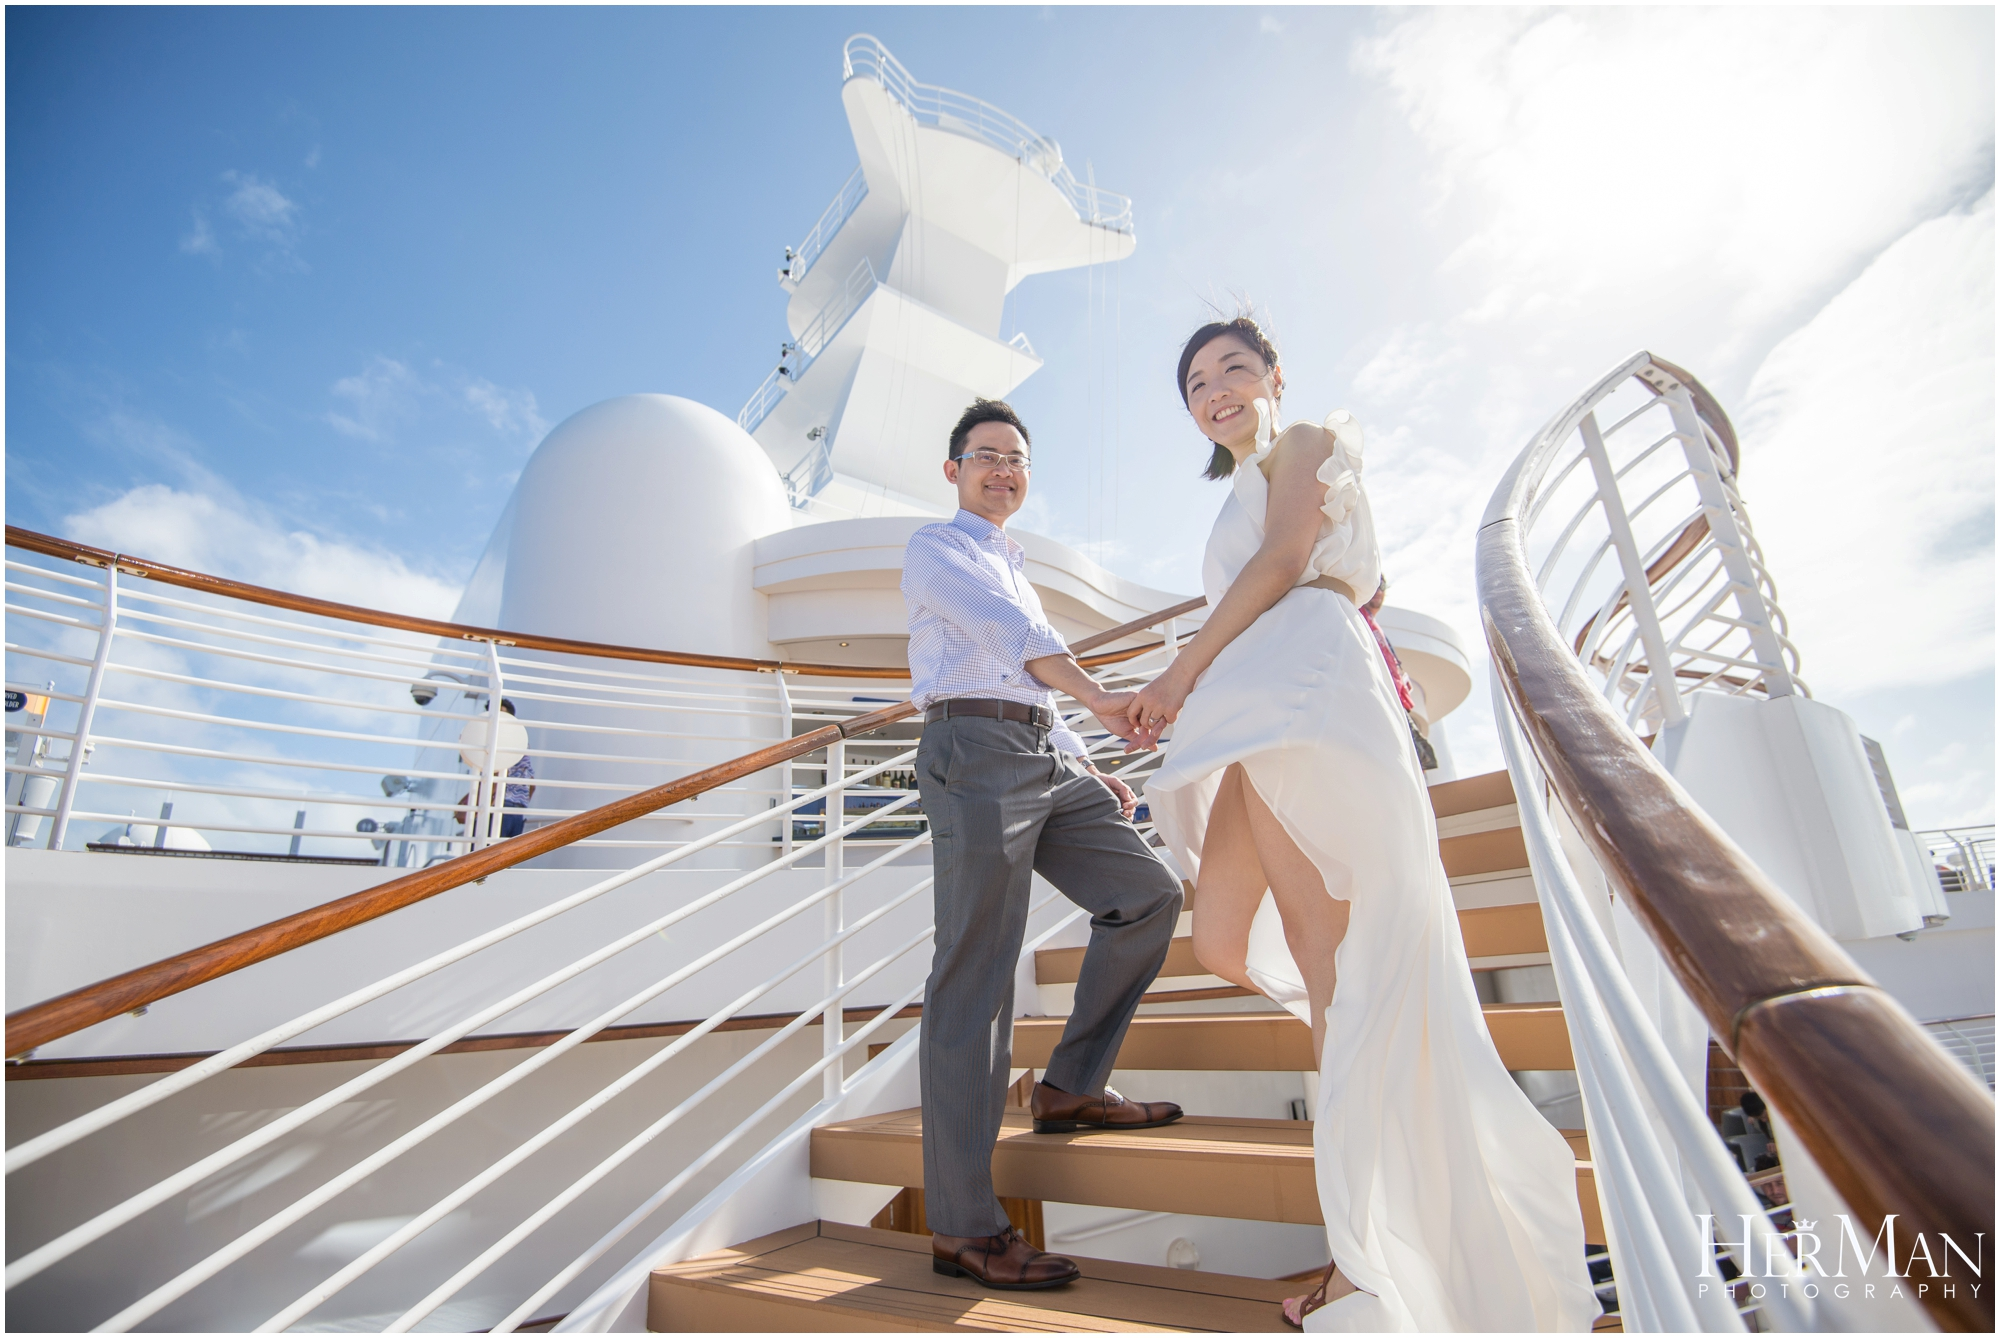 disney-fantasy-cruise-wedding-HerMan-photography_0008.jpg